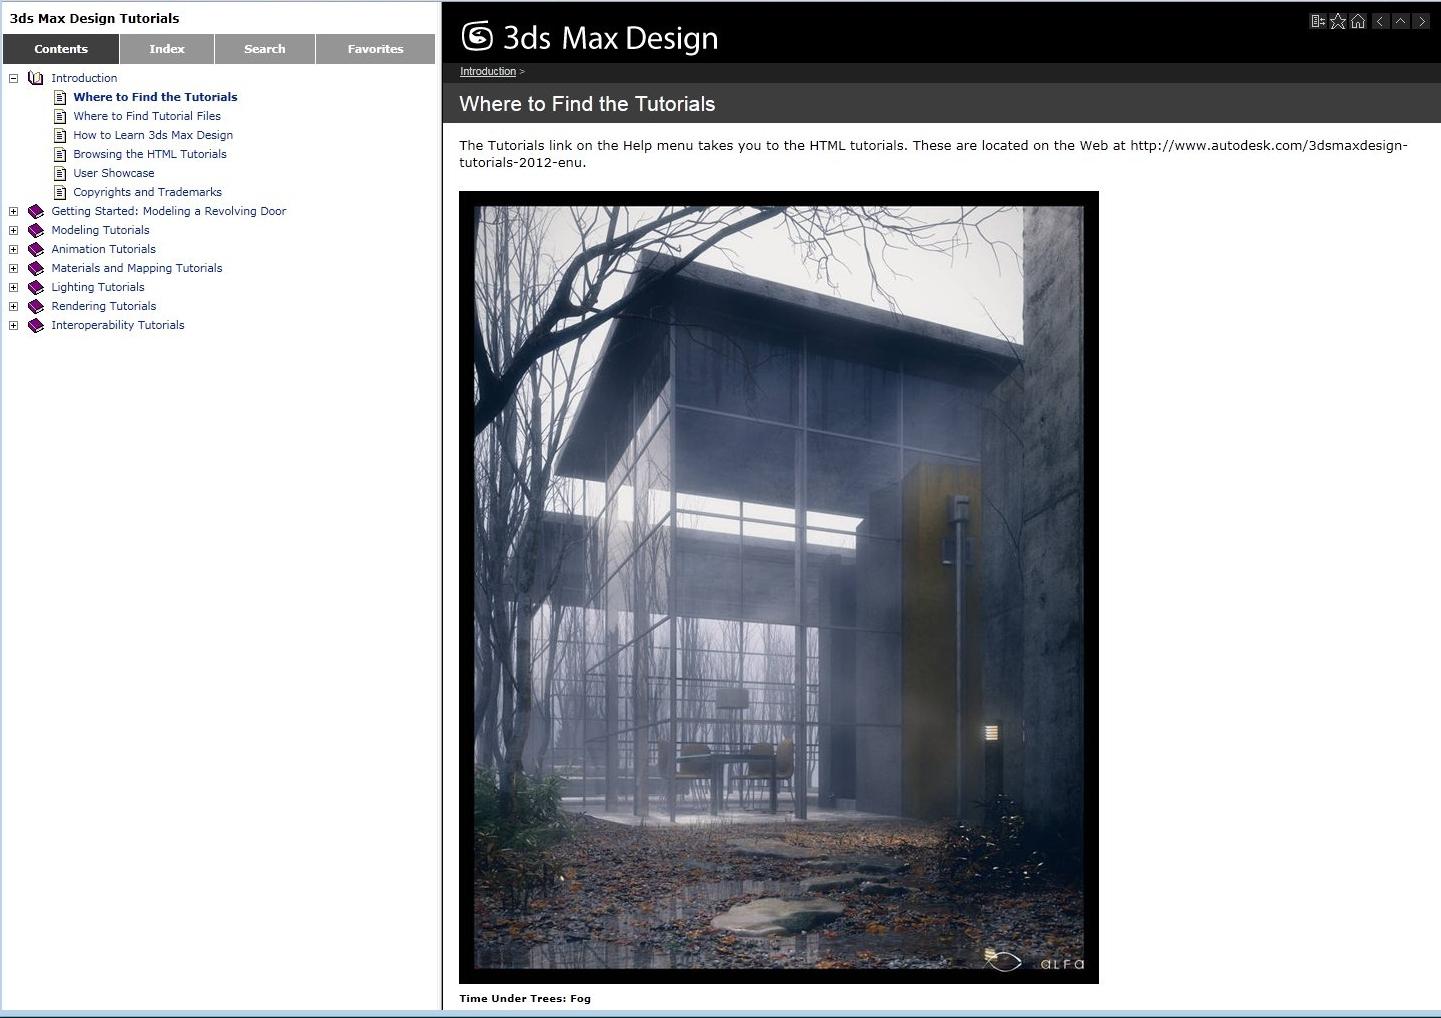 Autodesk 3DSMax 2012 Online Help Tutorials